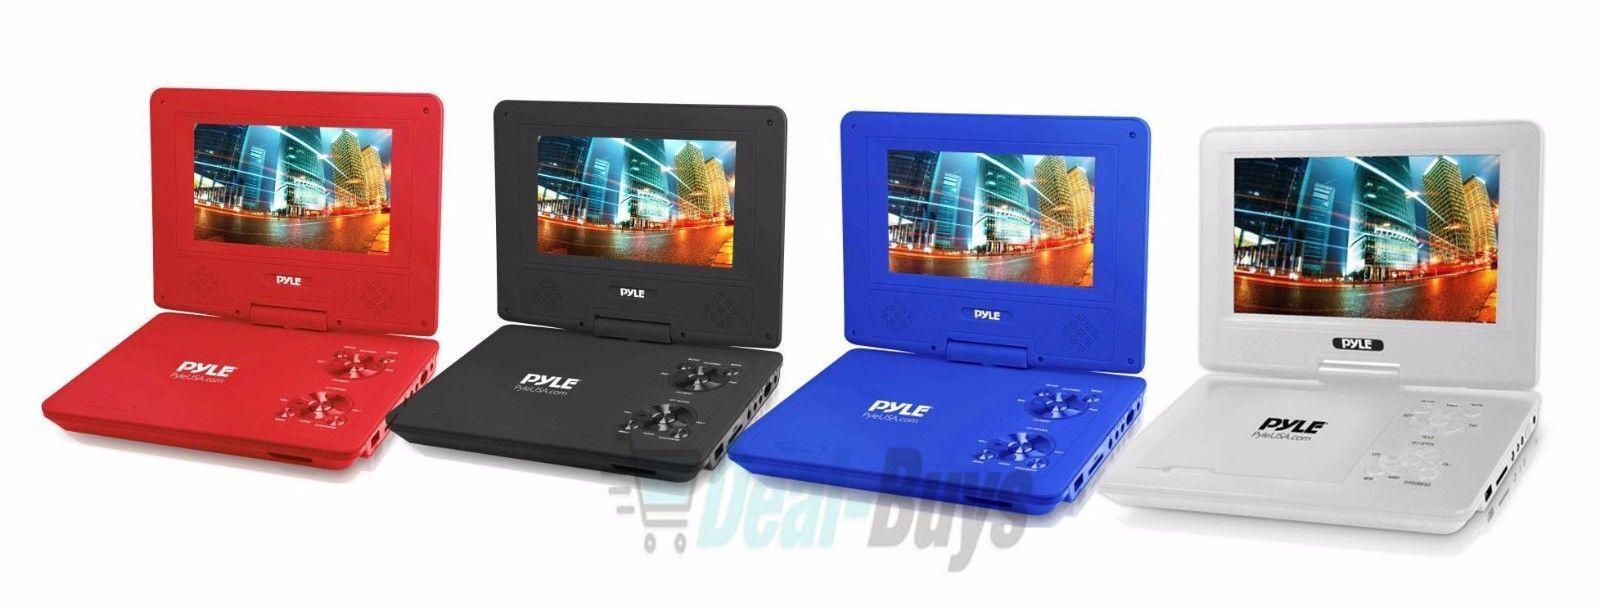 Pyle 7'' Portable DVD Player, Built-in Rechargeable Batt